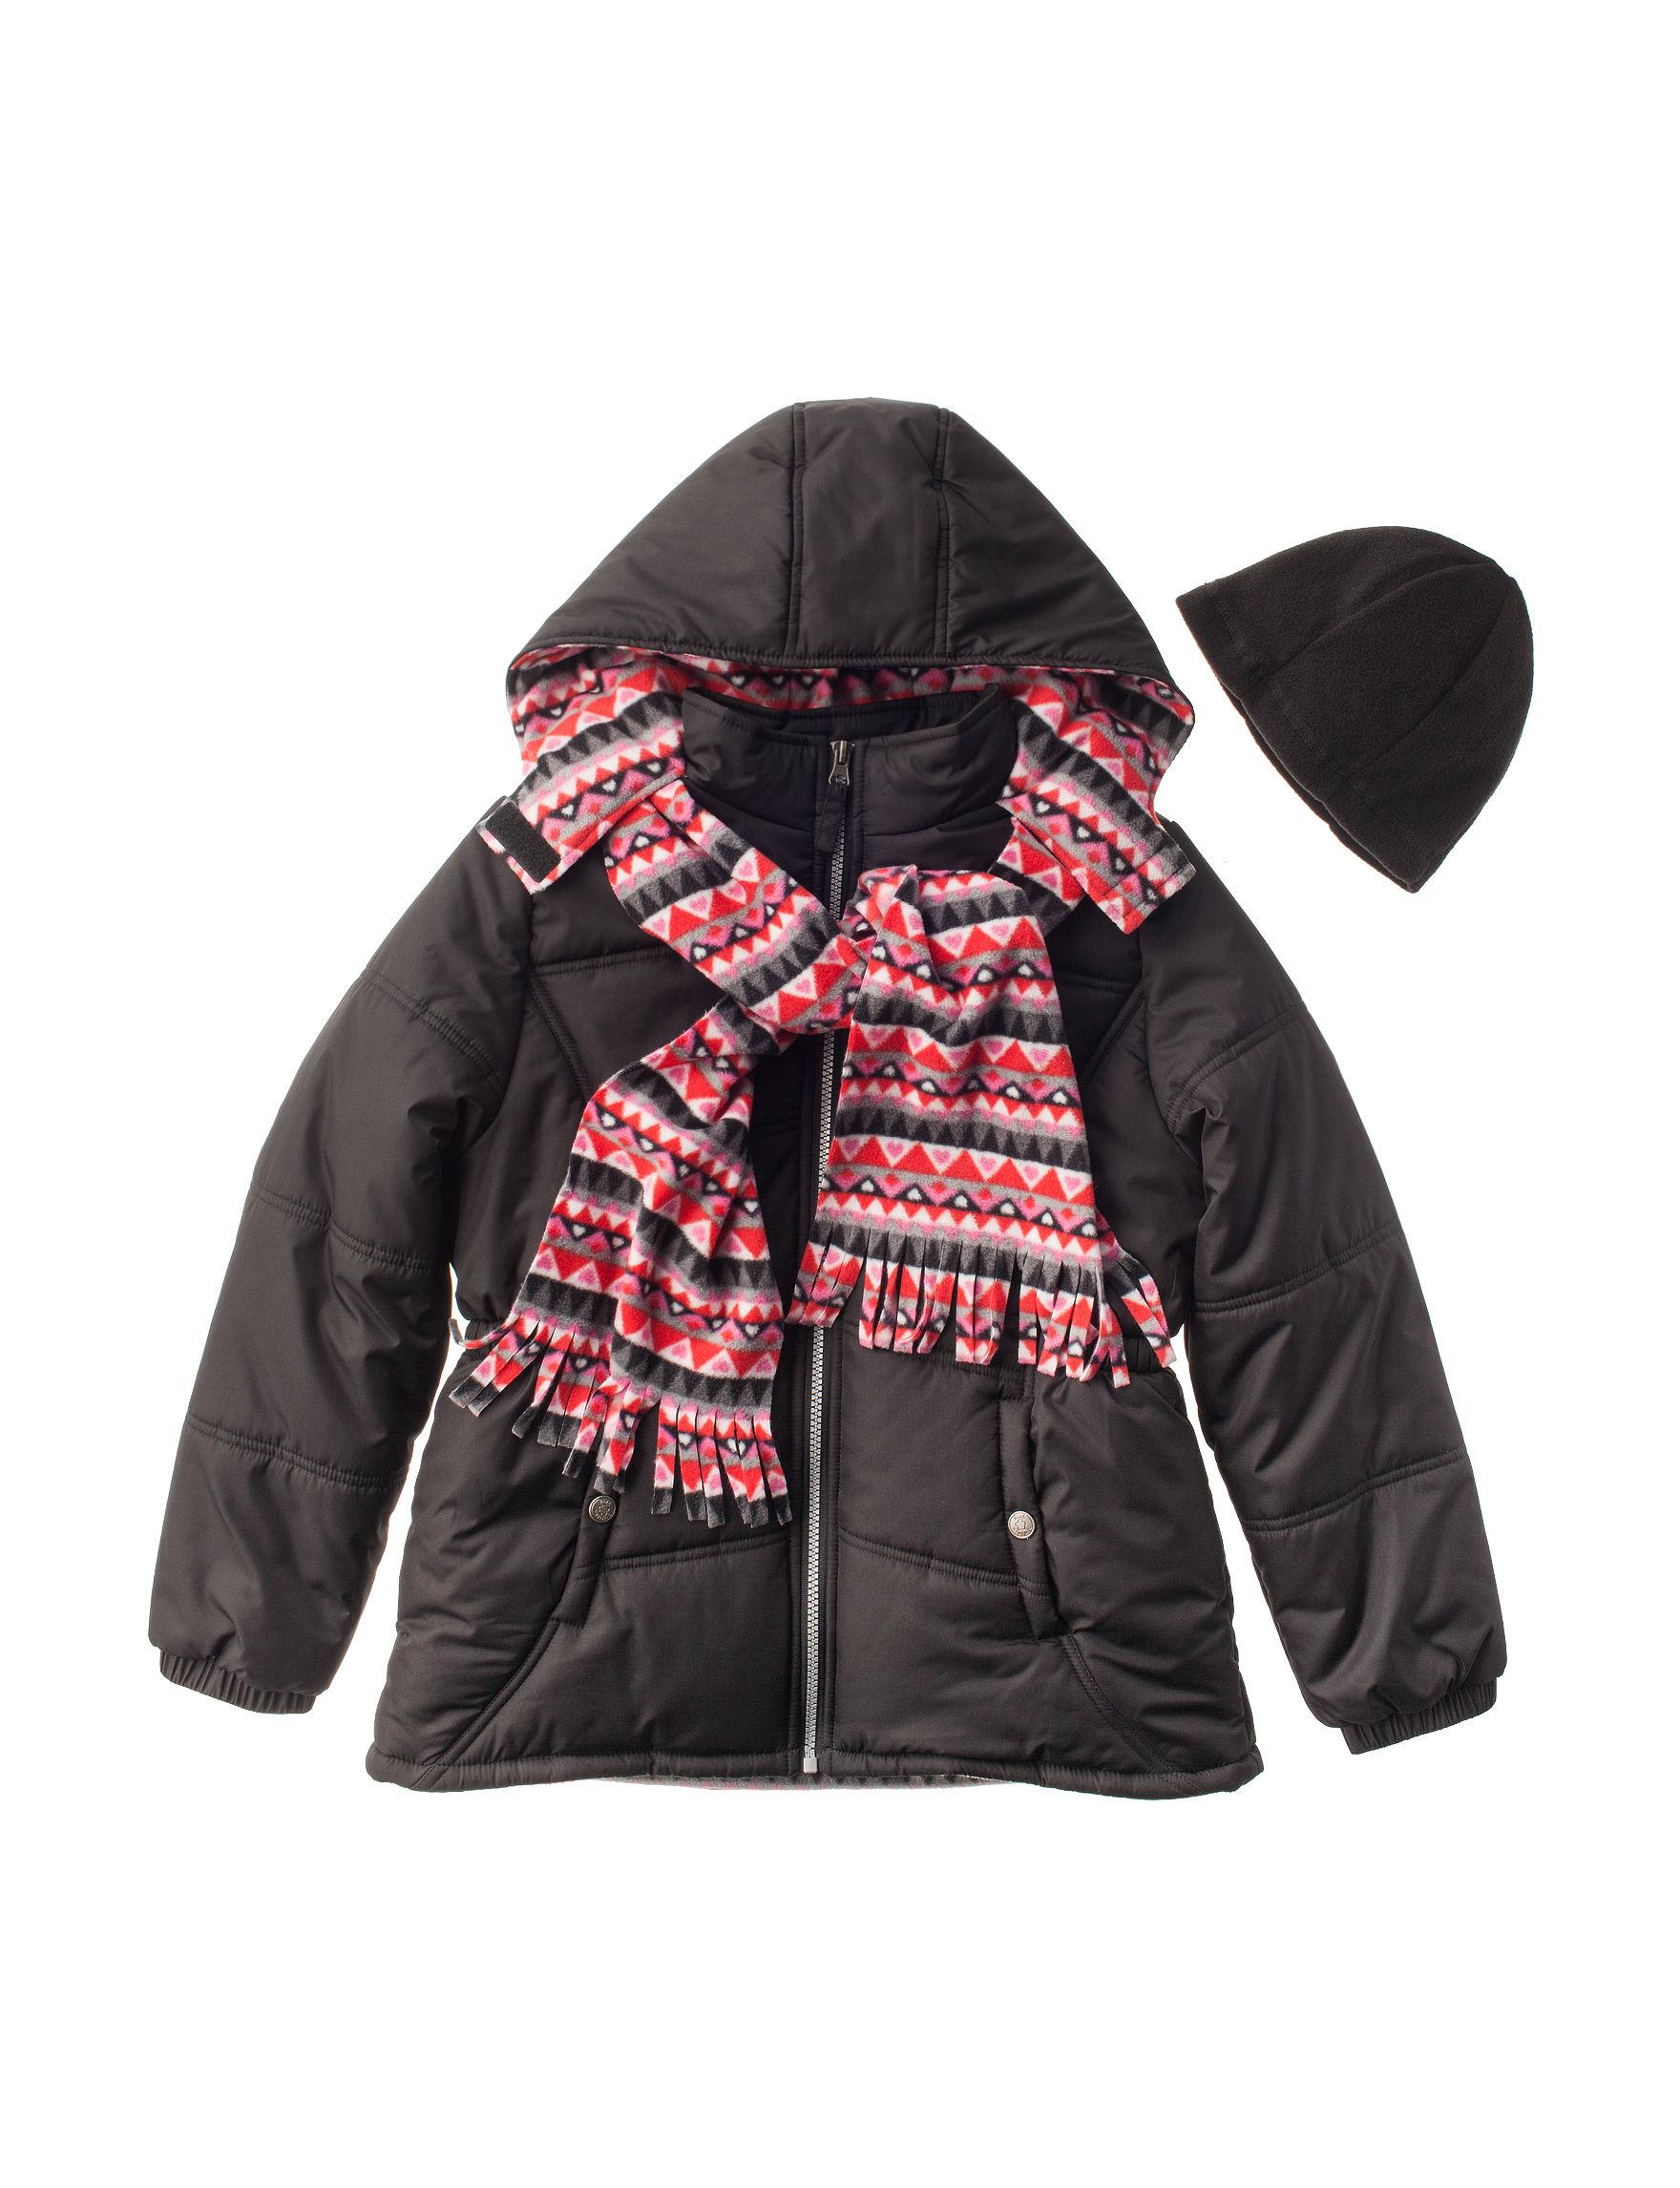 I Apparel Black Fleece & Soft Shell Jackets